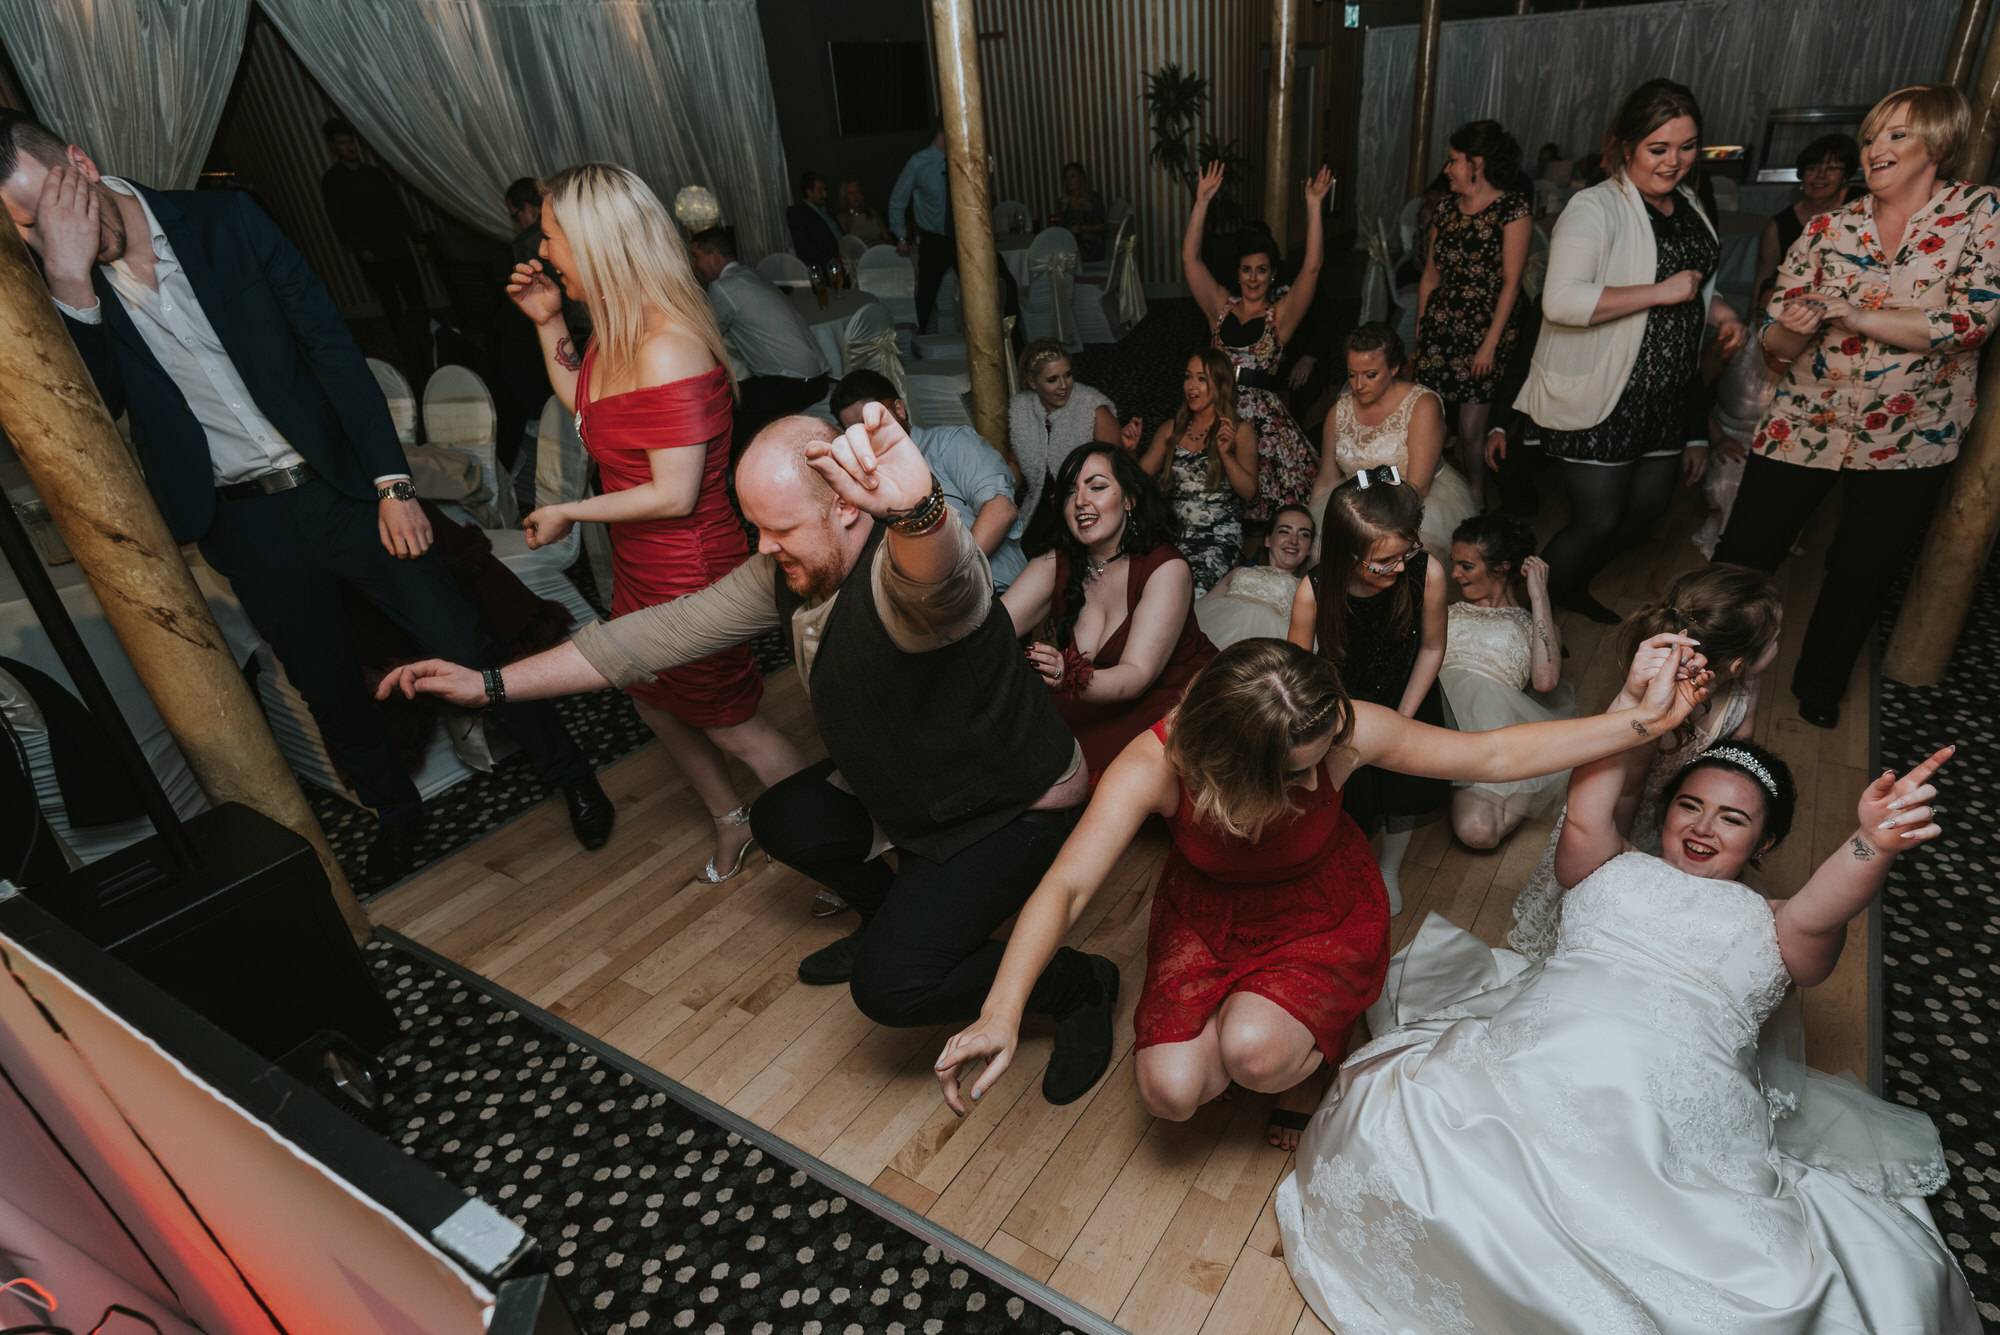 wedding photographer belfast ten square hotel dancing everyone laughing